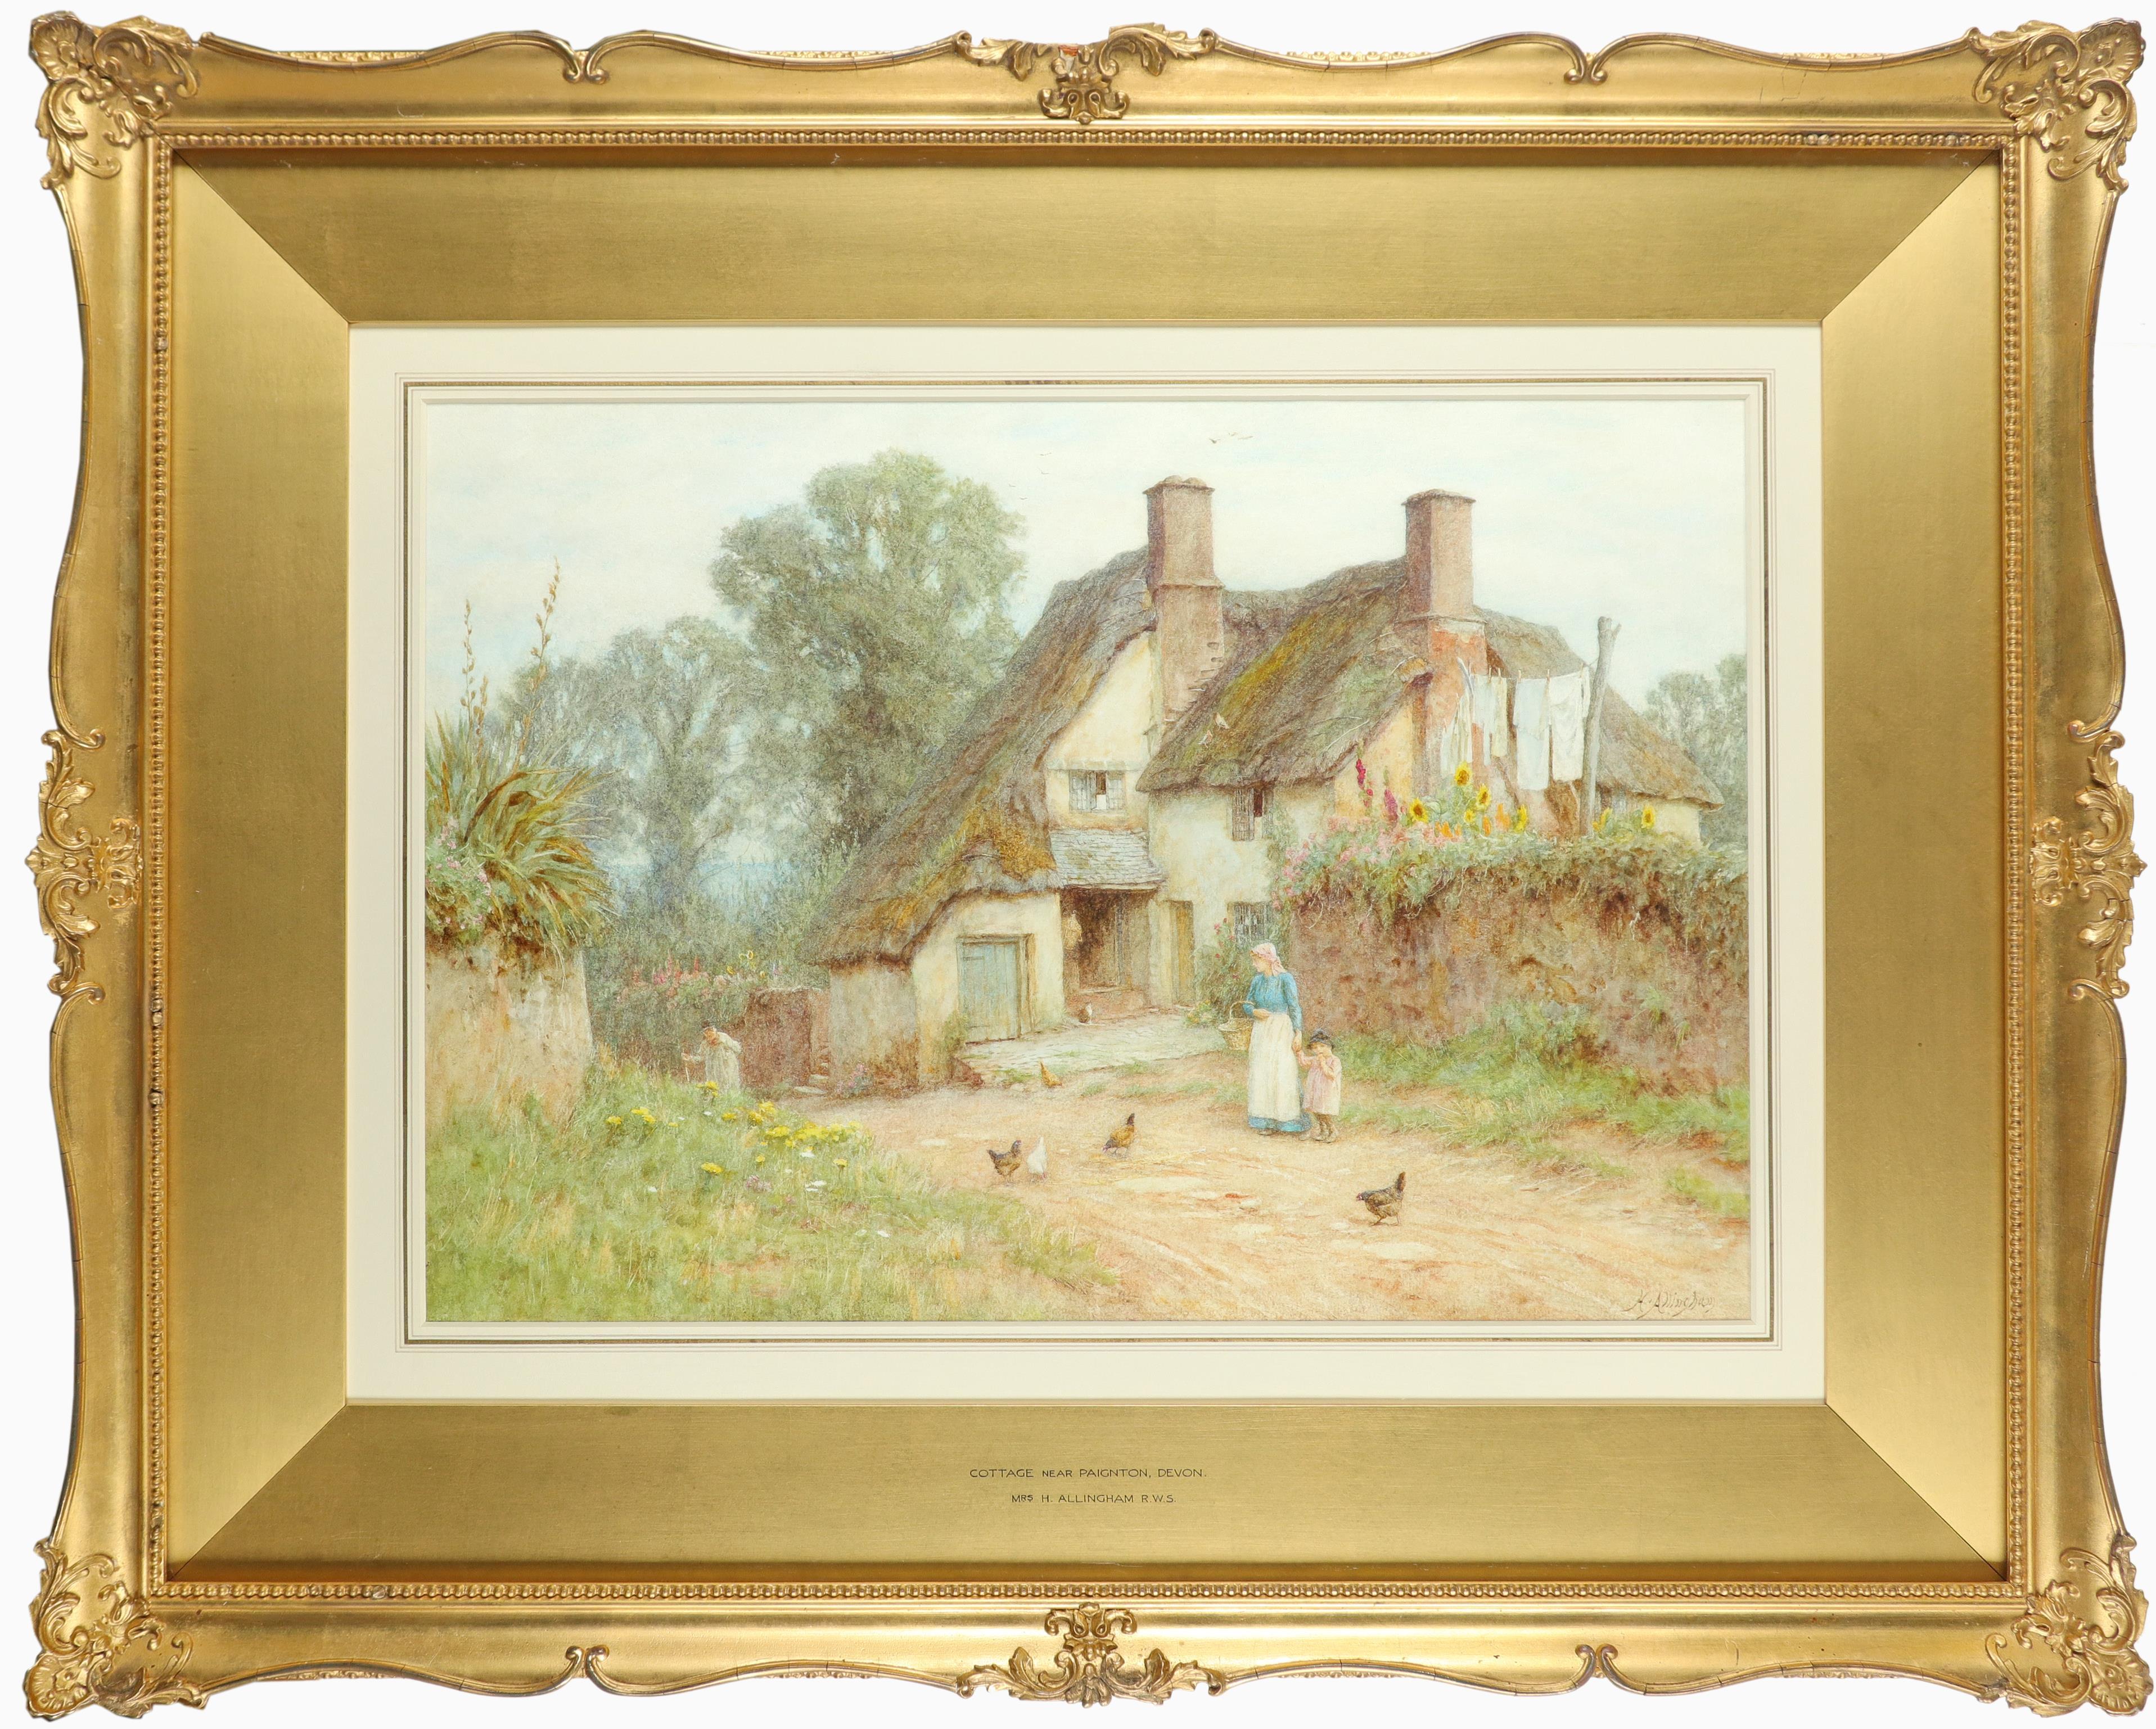 Helen Allingham RWS (1848-1926) Cottage near Paignton, Devon Signed H.Allingham (lower right) Pencil - Image 2 of 3